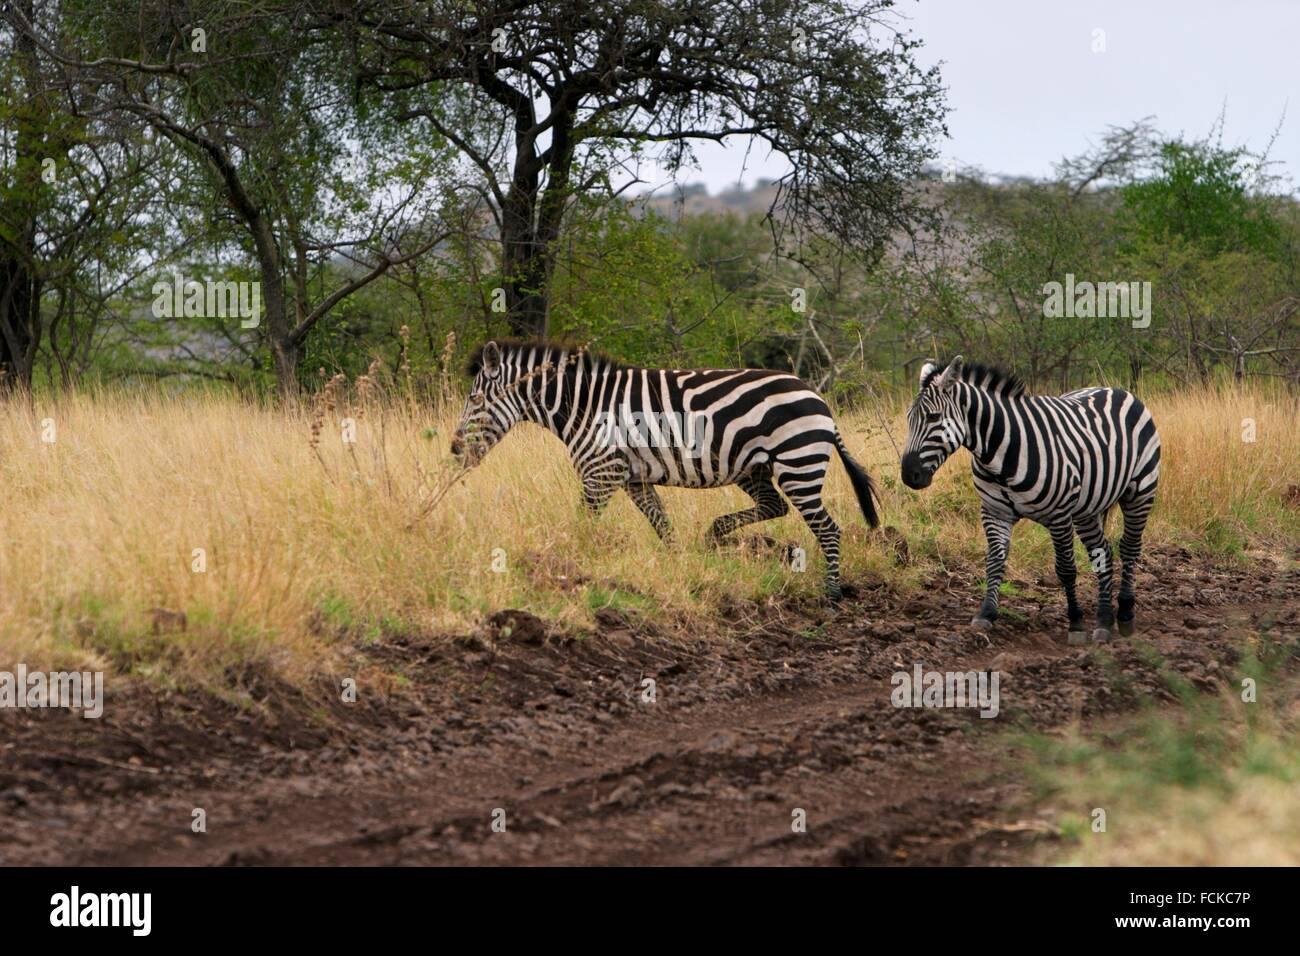 Zebras crossing the track in the Nechisar Park, Arbaminch, Africa Stock Photo